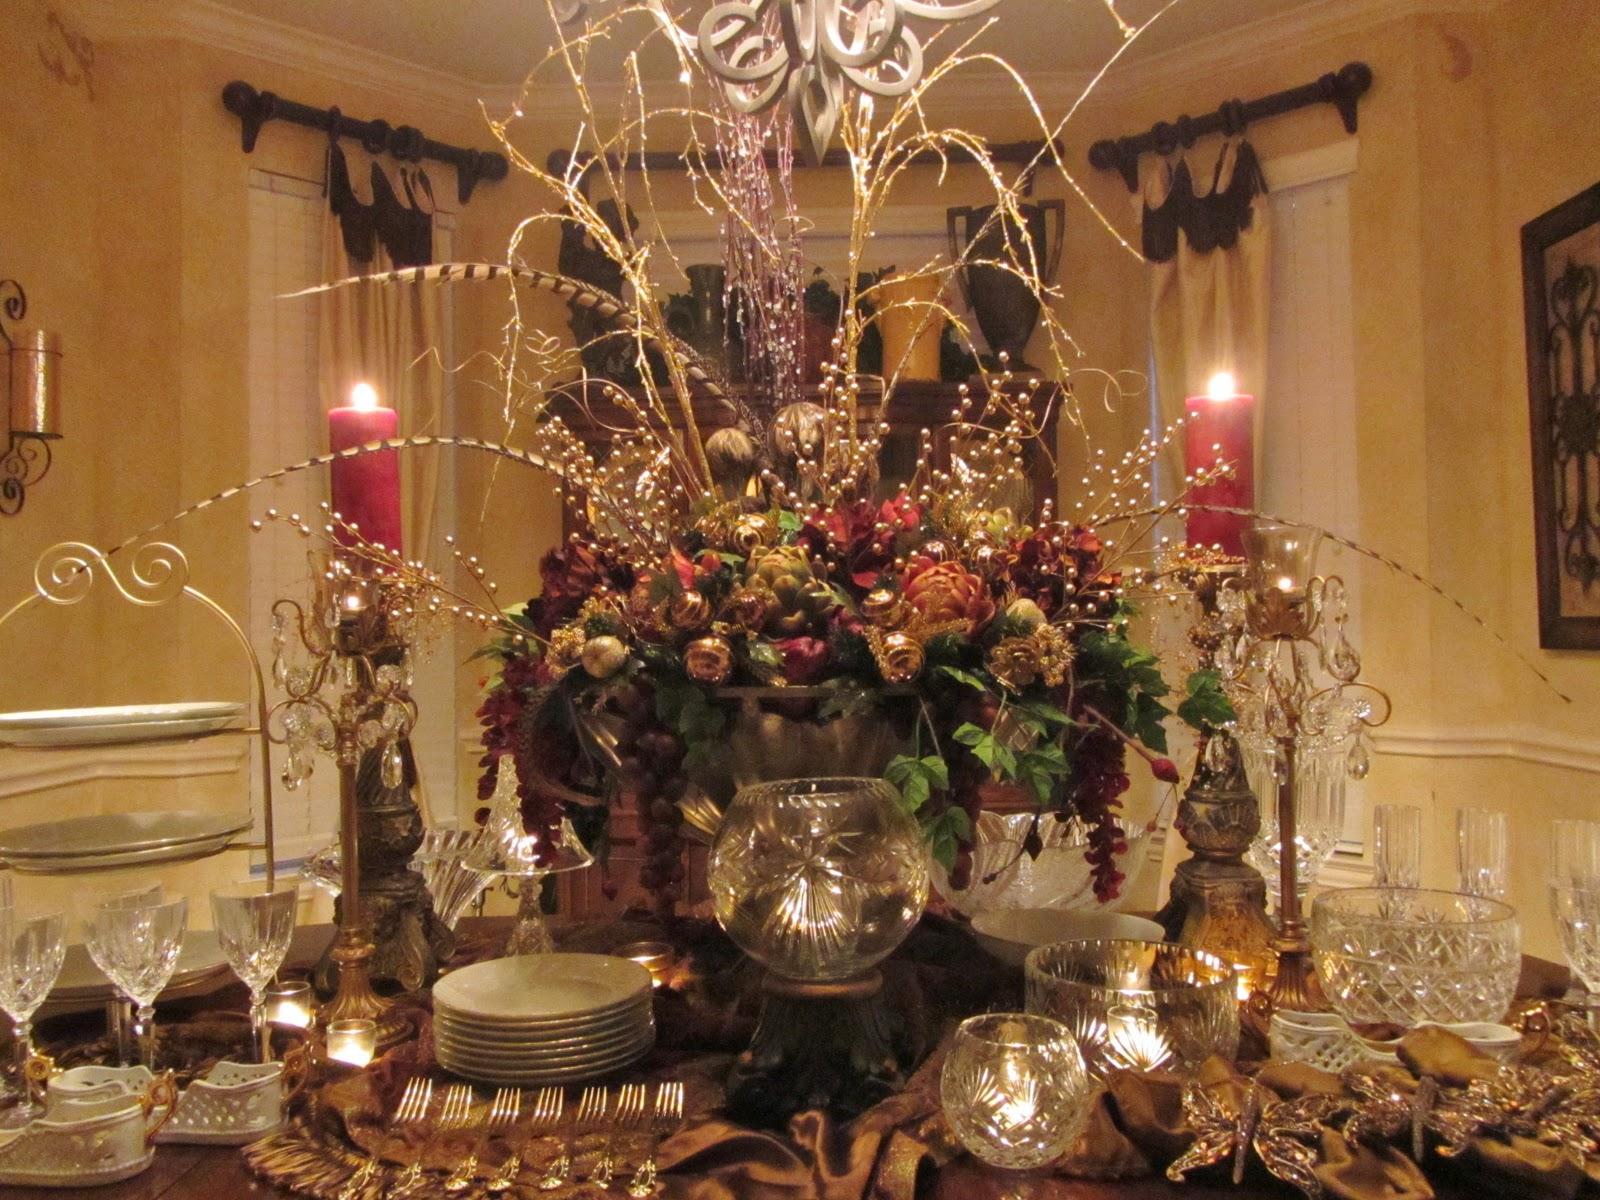 Type A Embellishments By Slr 19 Days Til Christmas